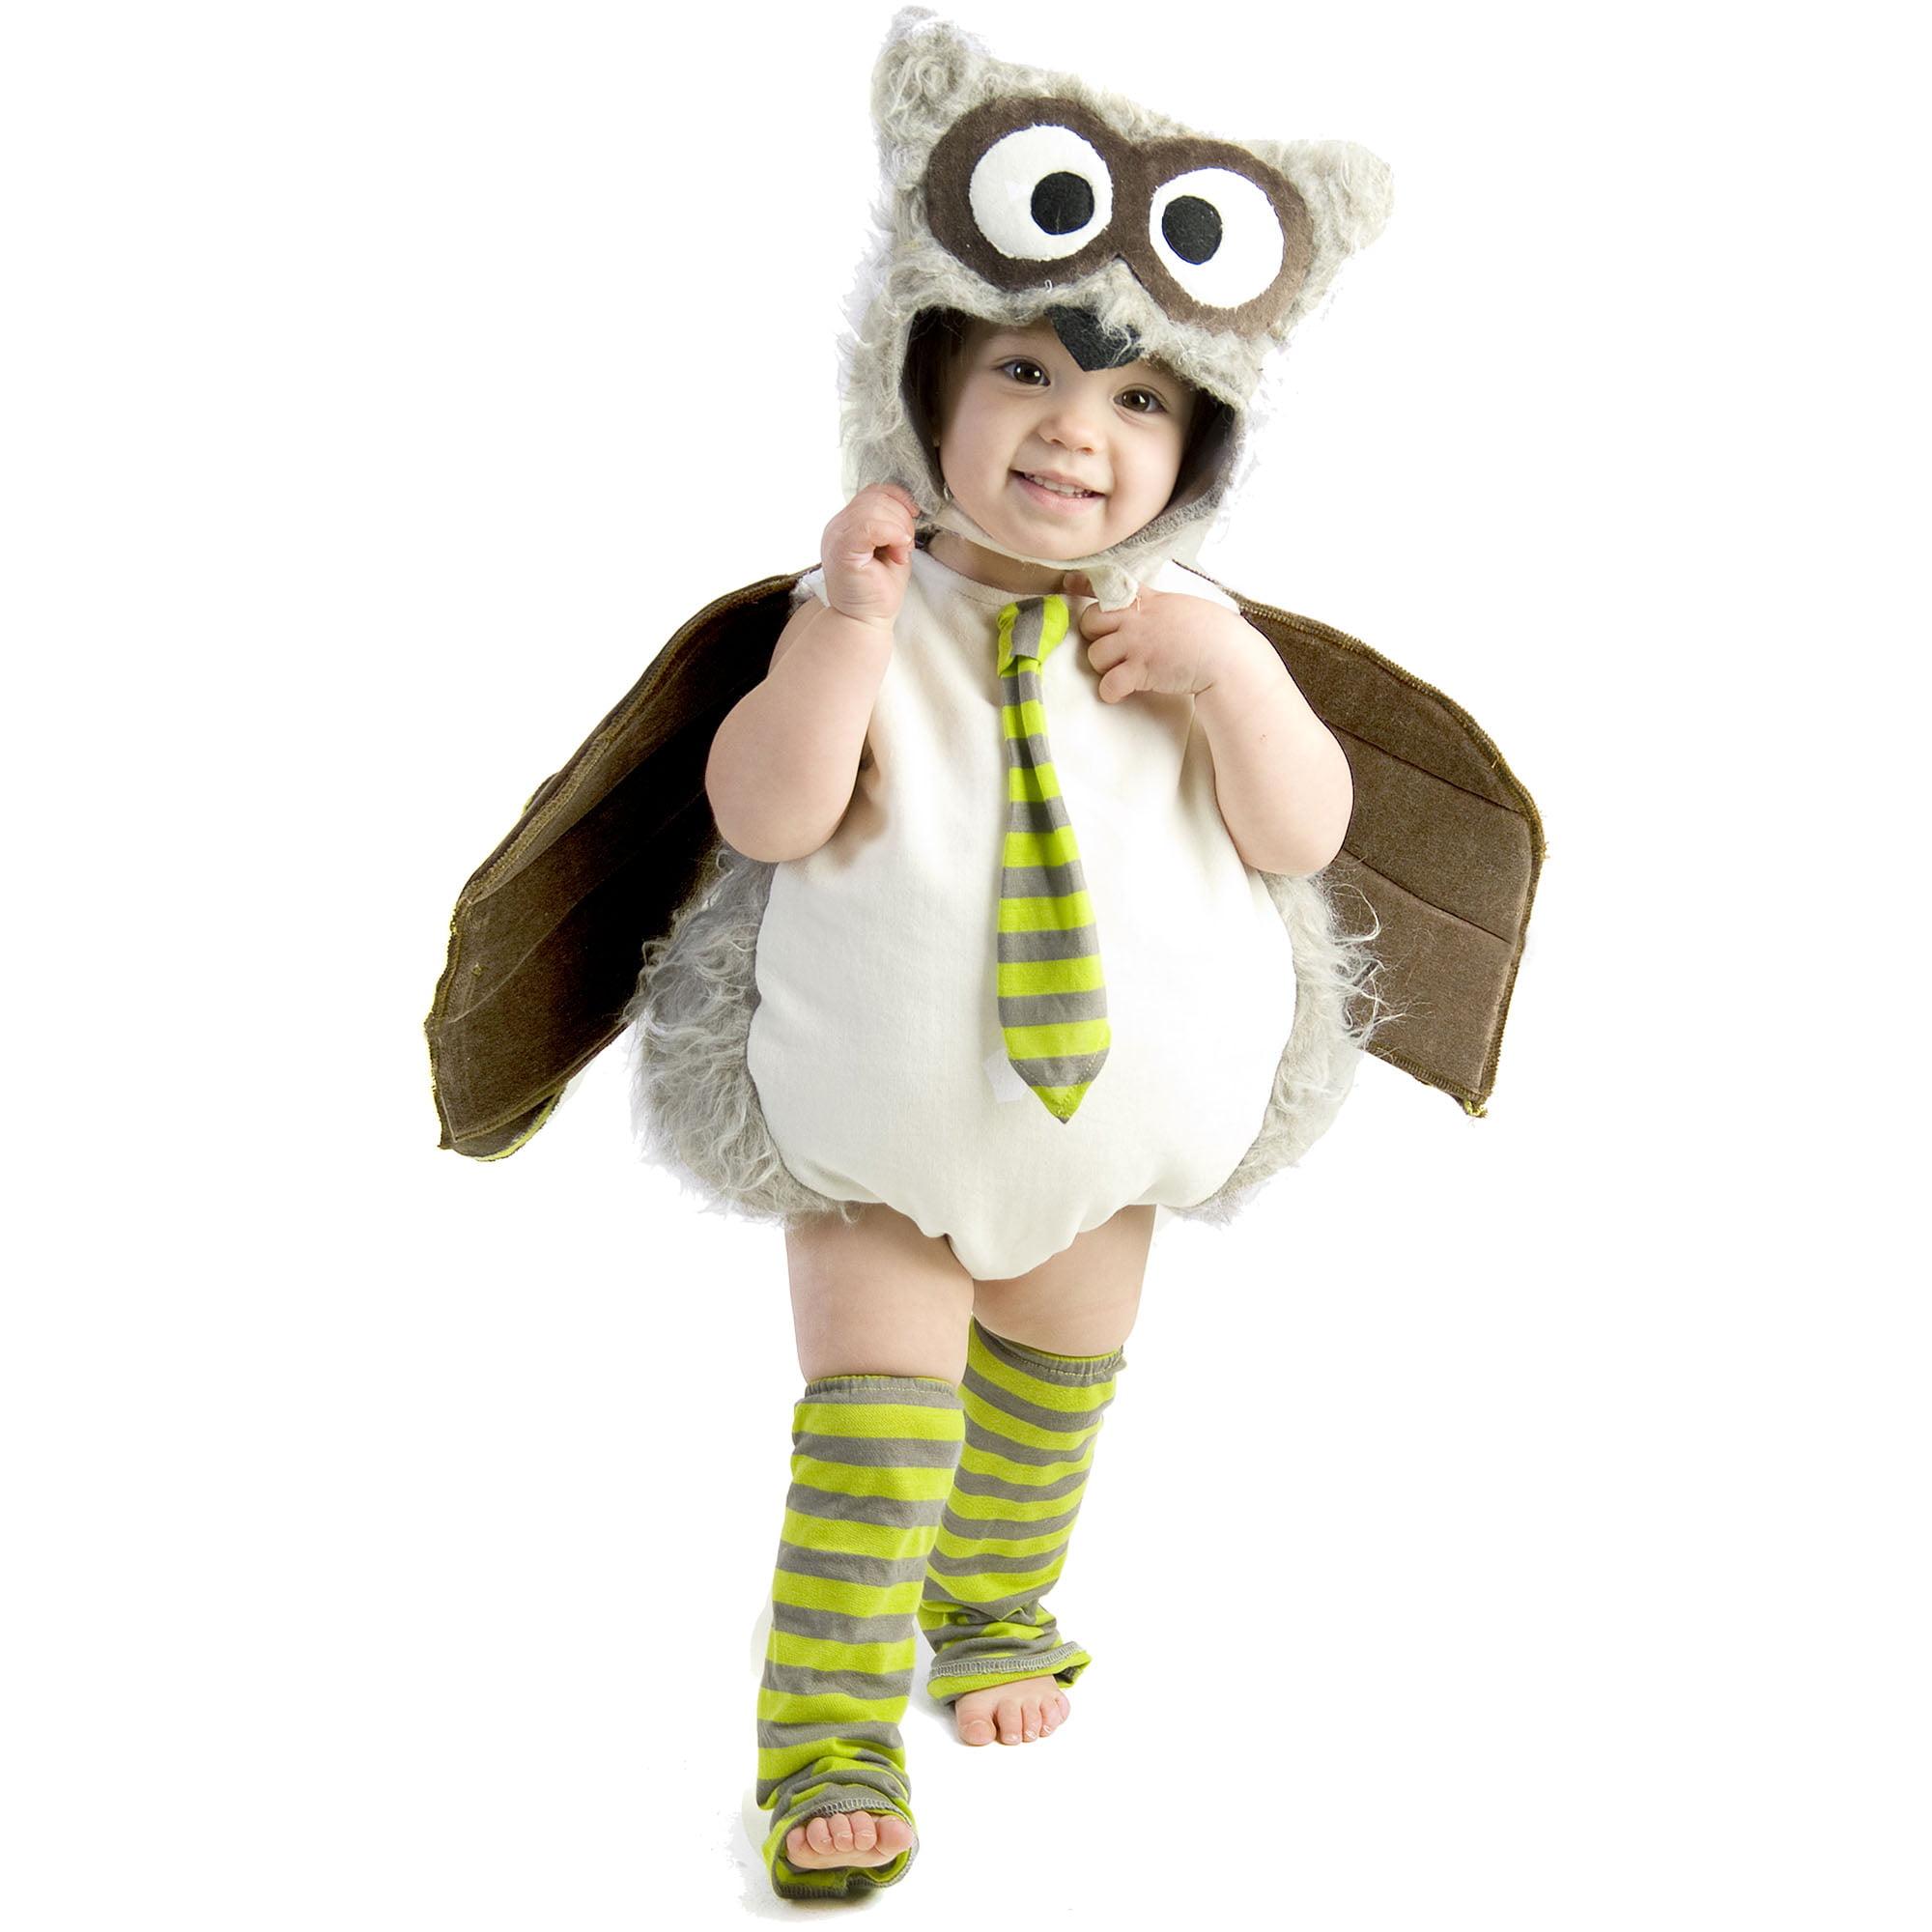 Princess Paradise Premium Edward the Owl Toddler Costume